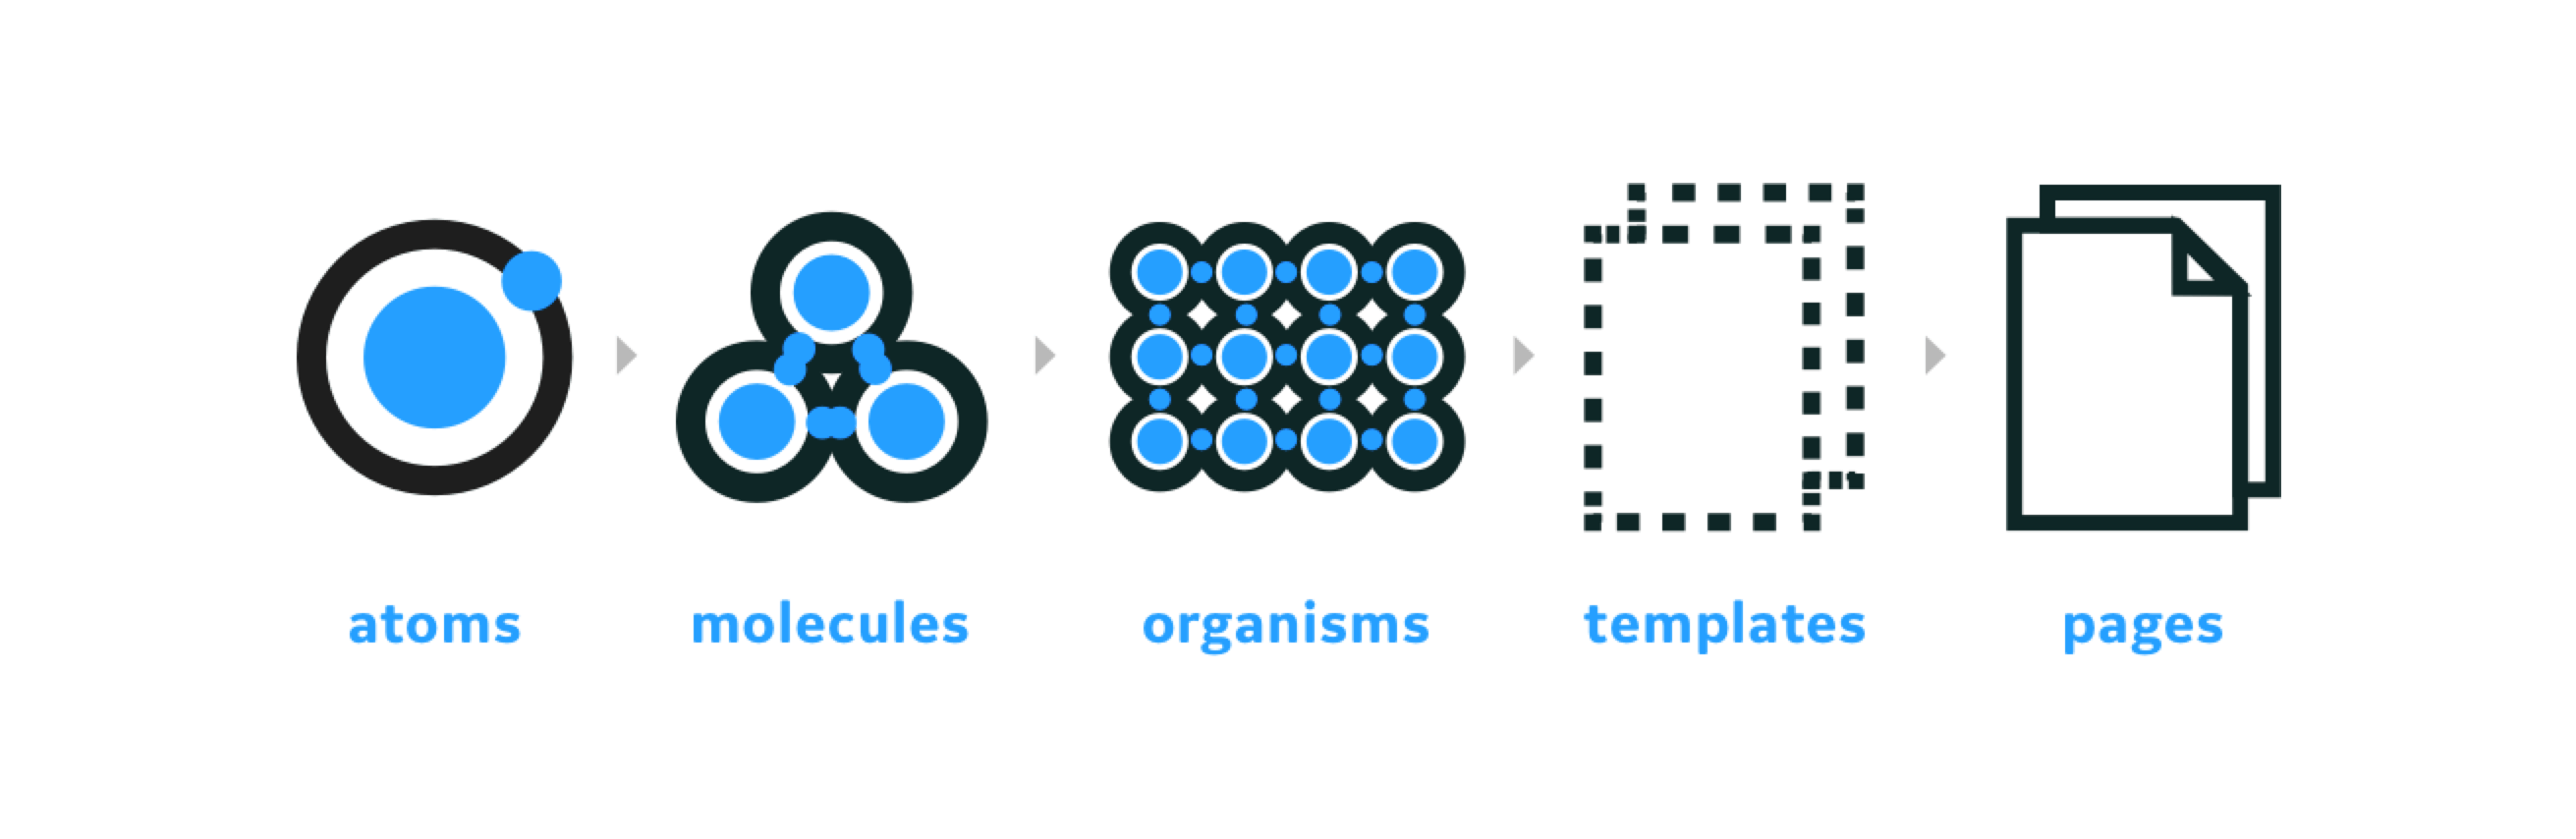 Introducing Stuart's Design System [image 2]